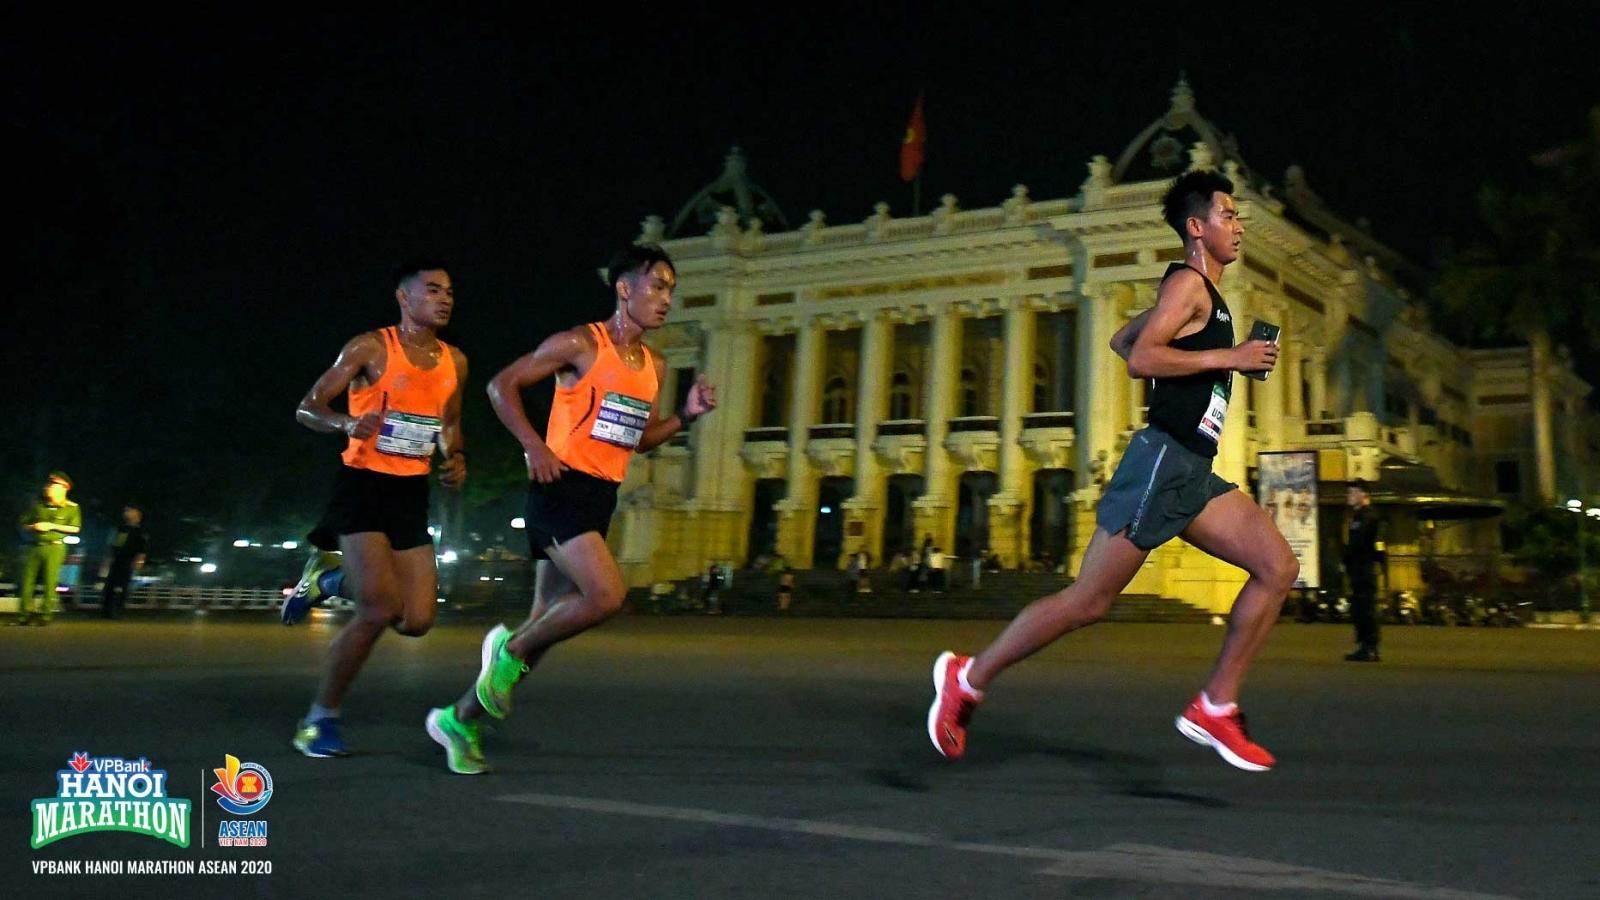 VPBank Hanoi Marathon ASEAN 2020: Nâng trách nhiệm Chủ tịch ASEAN